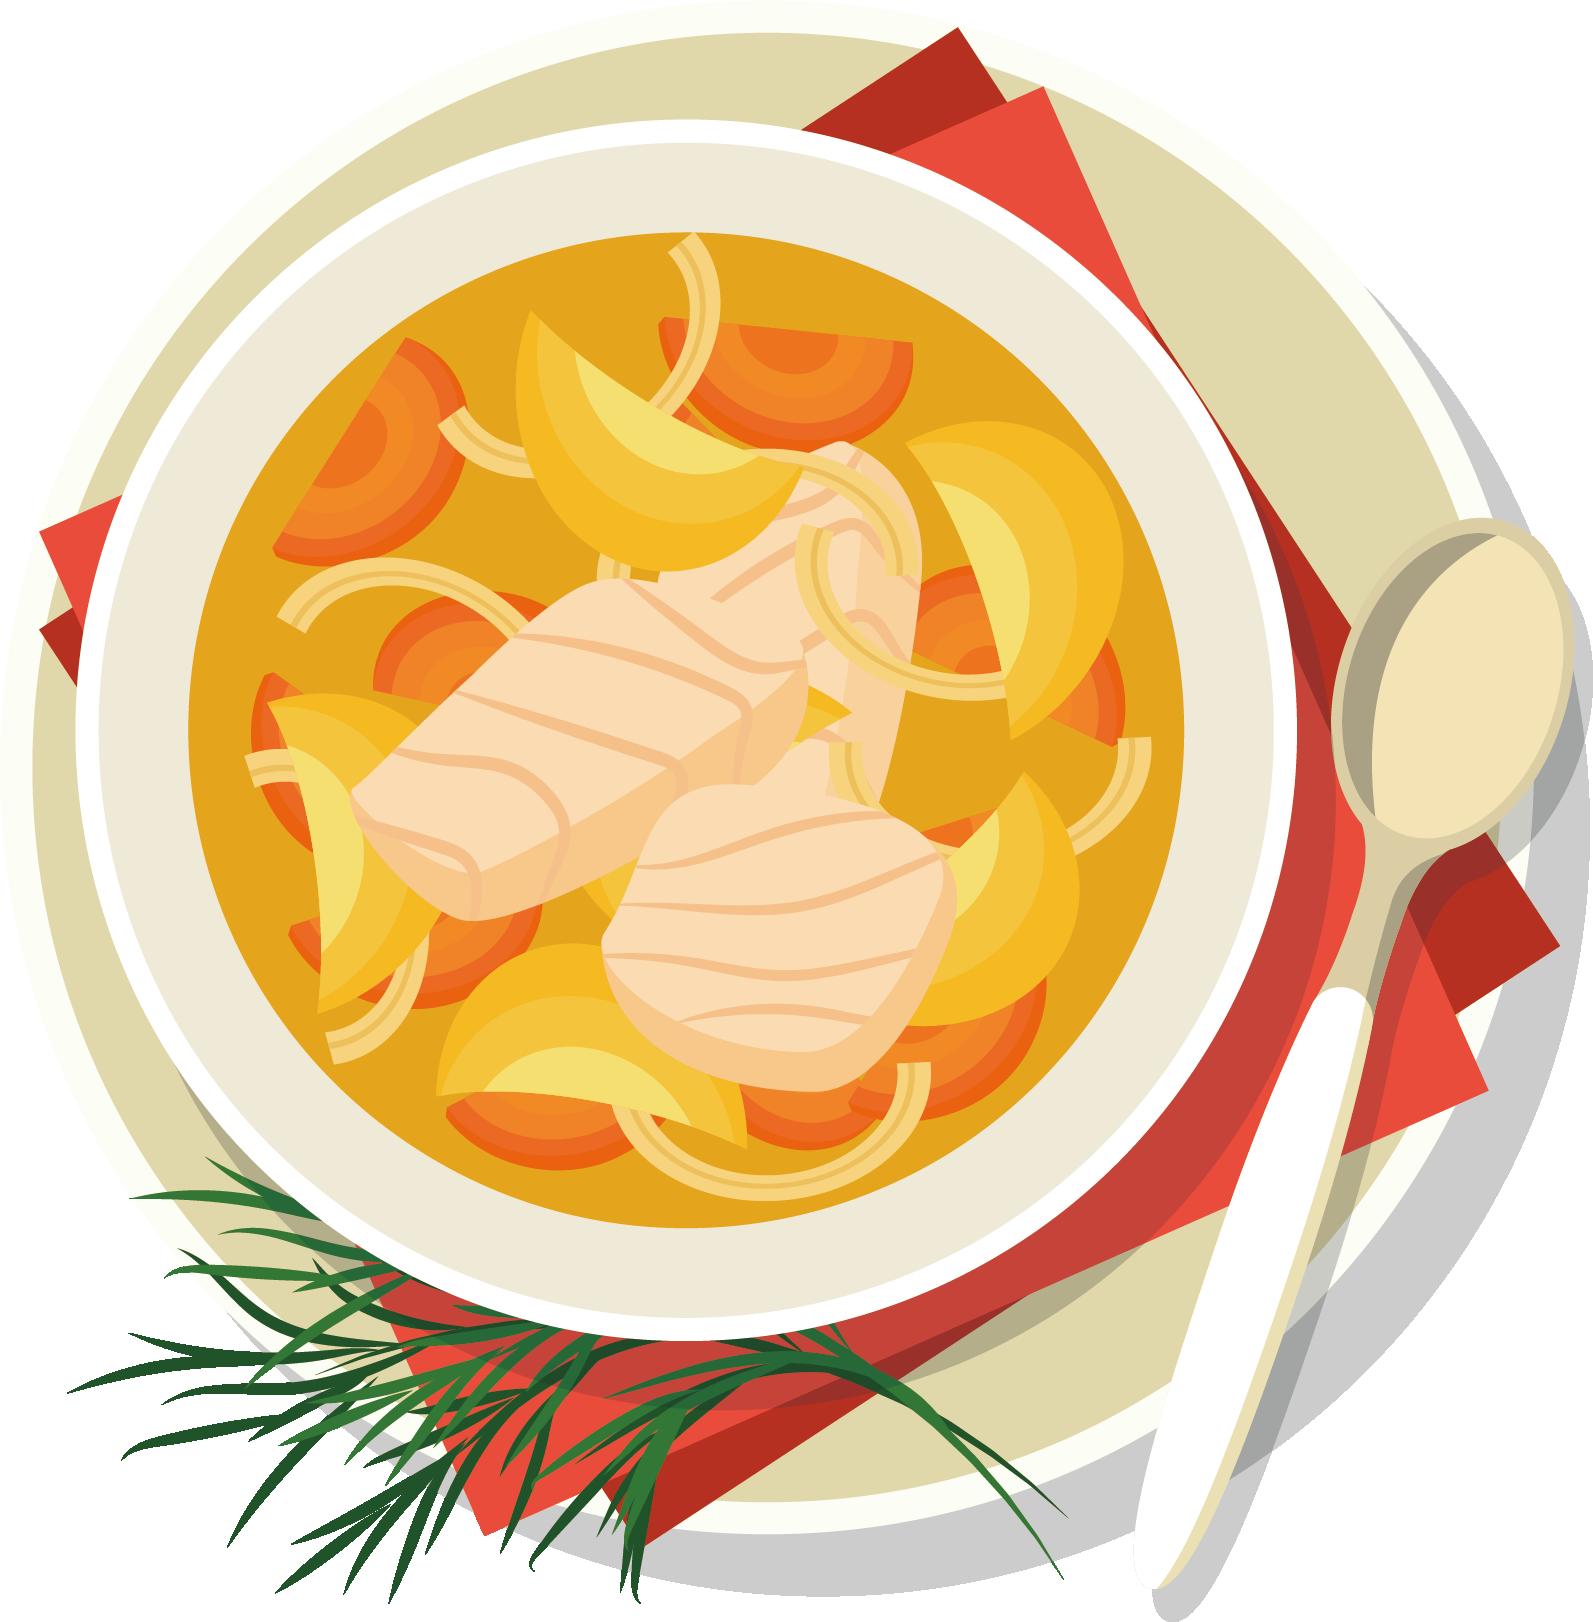 1593x1622 Shark Fin Soup Tomato Soup Corn Chowder Dish